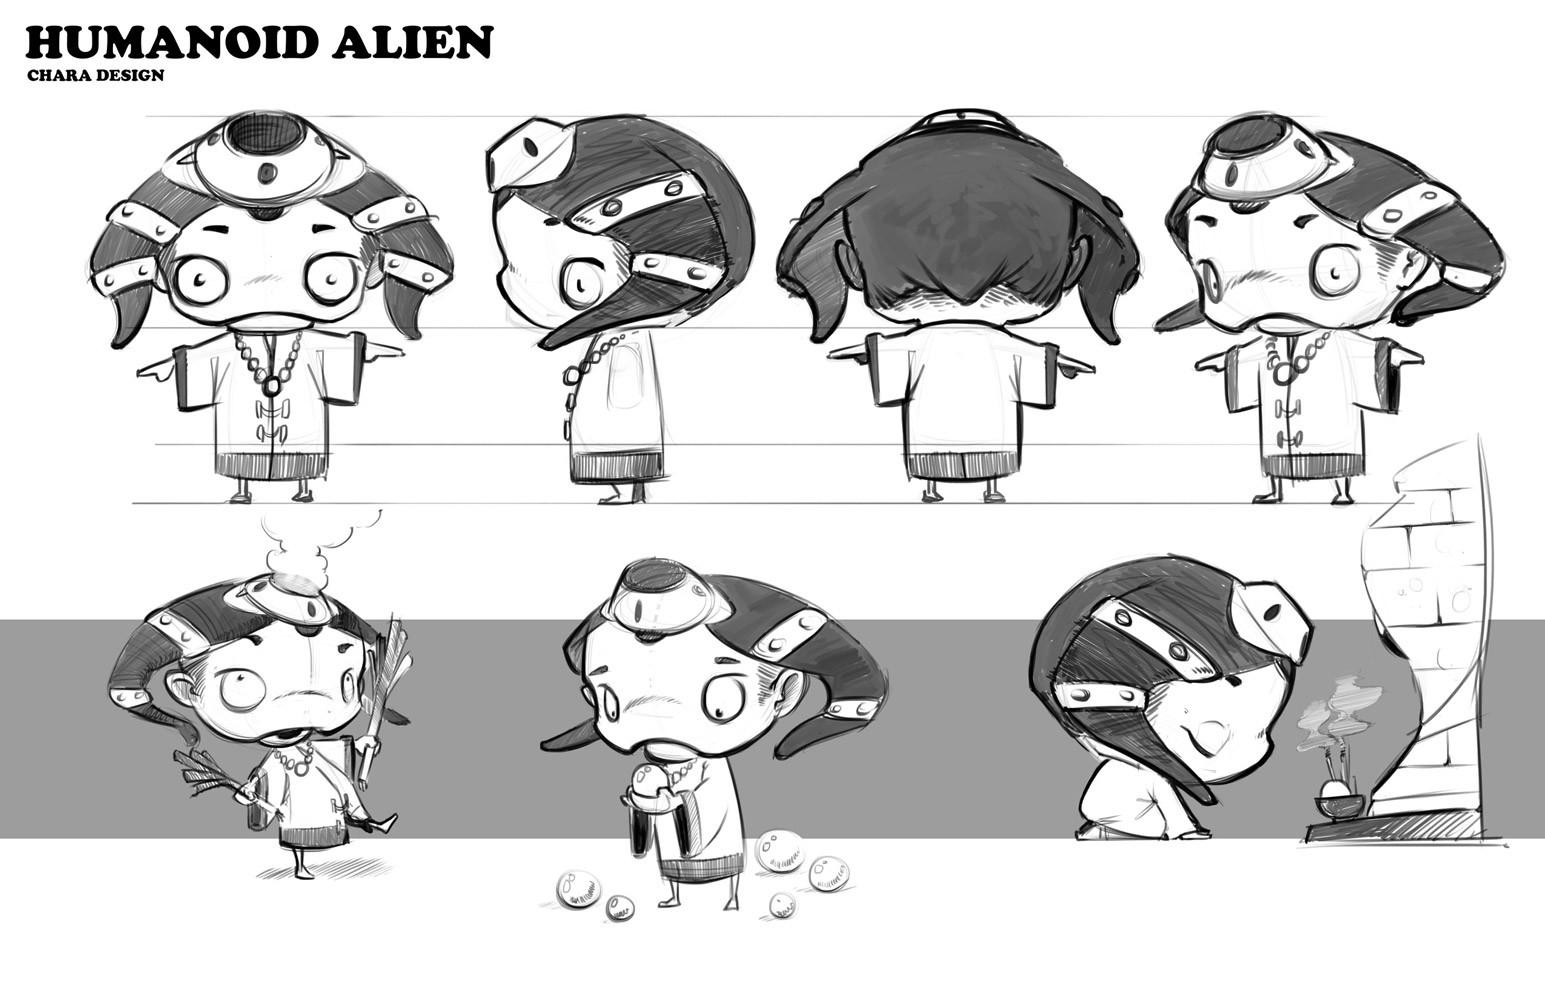 Atha kanaani character concept sheet humanoid alien